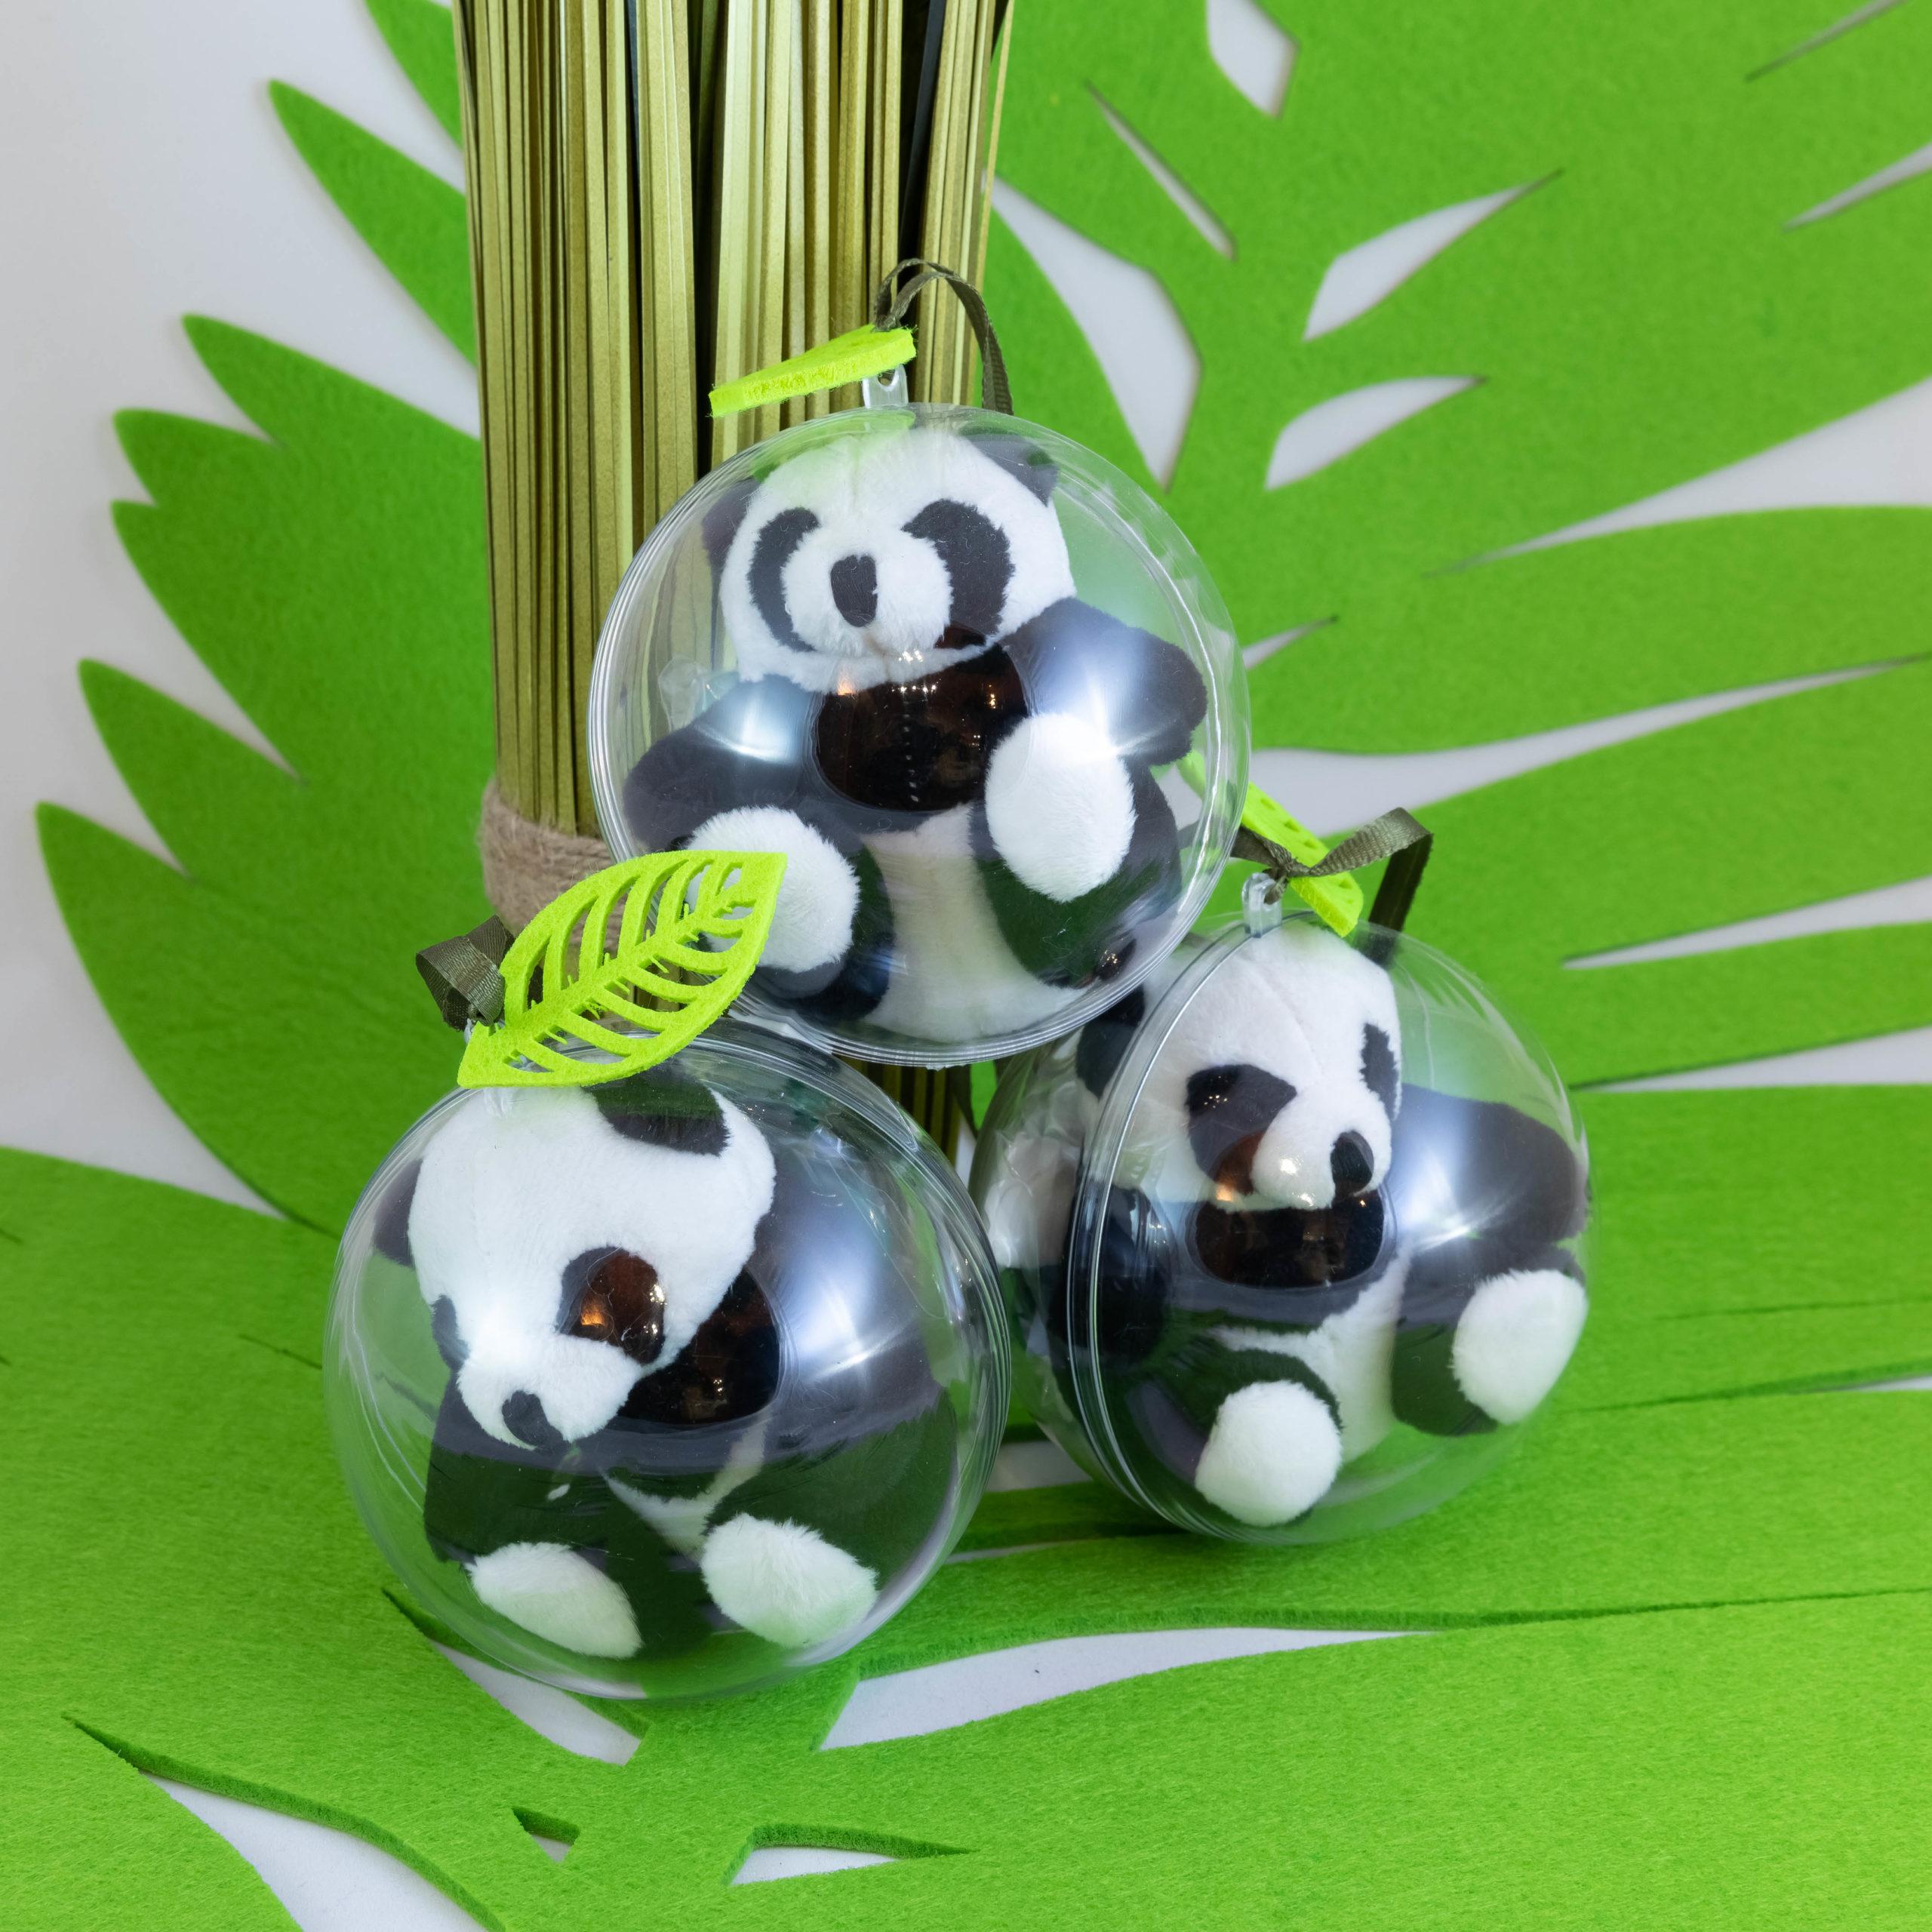 Boule peluche - Panda Image